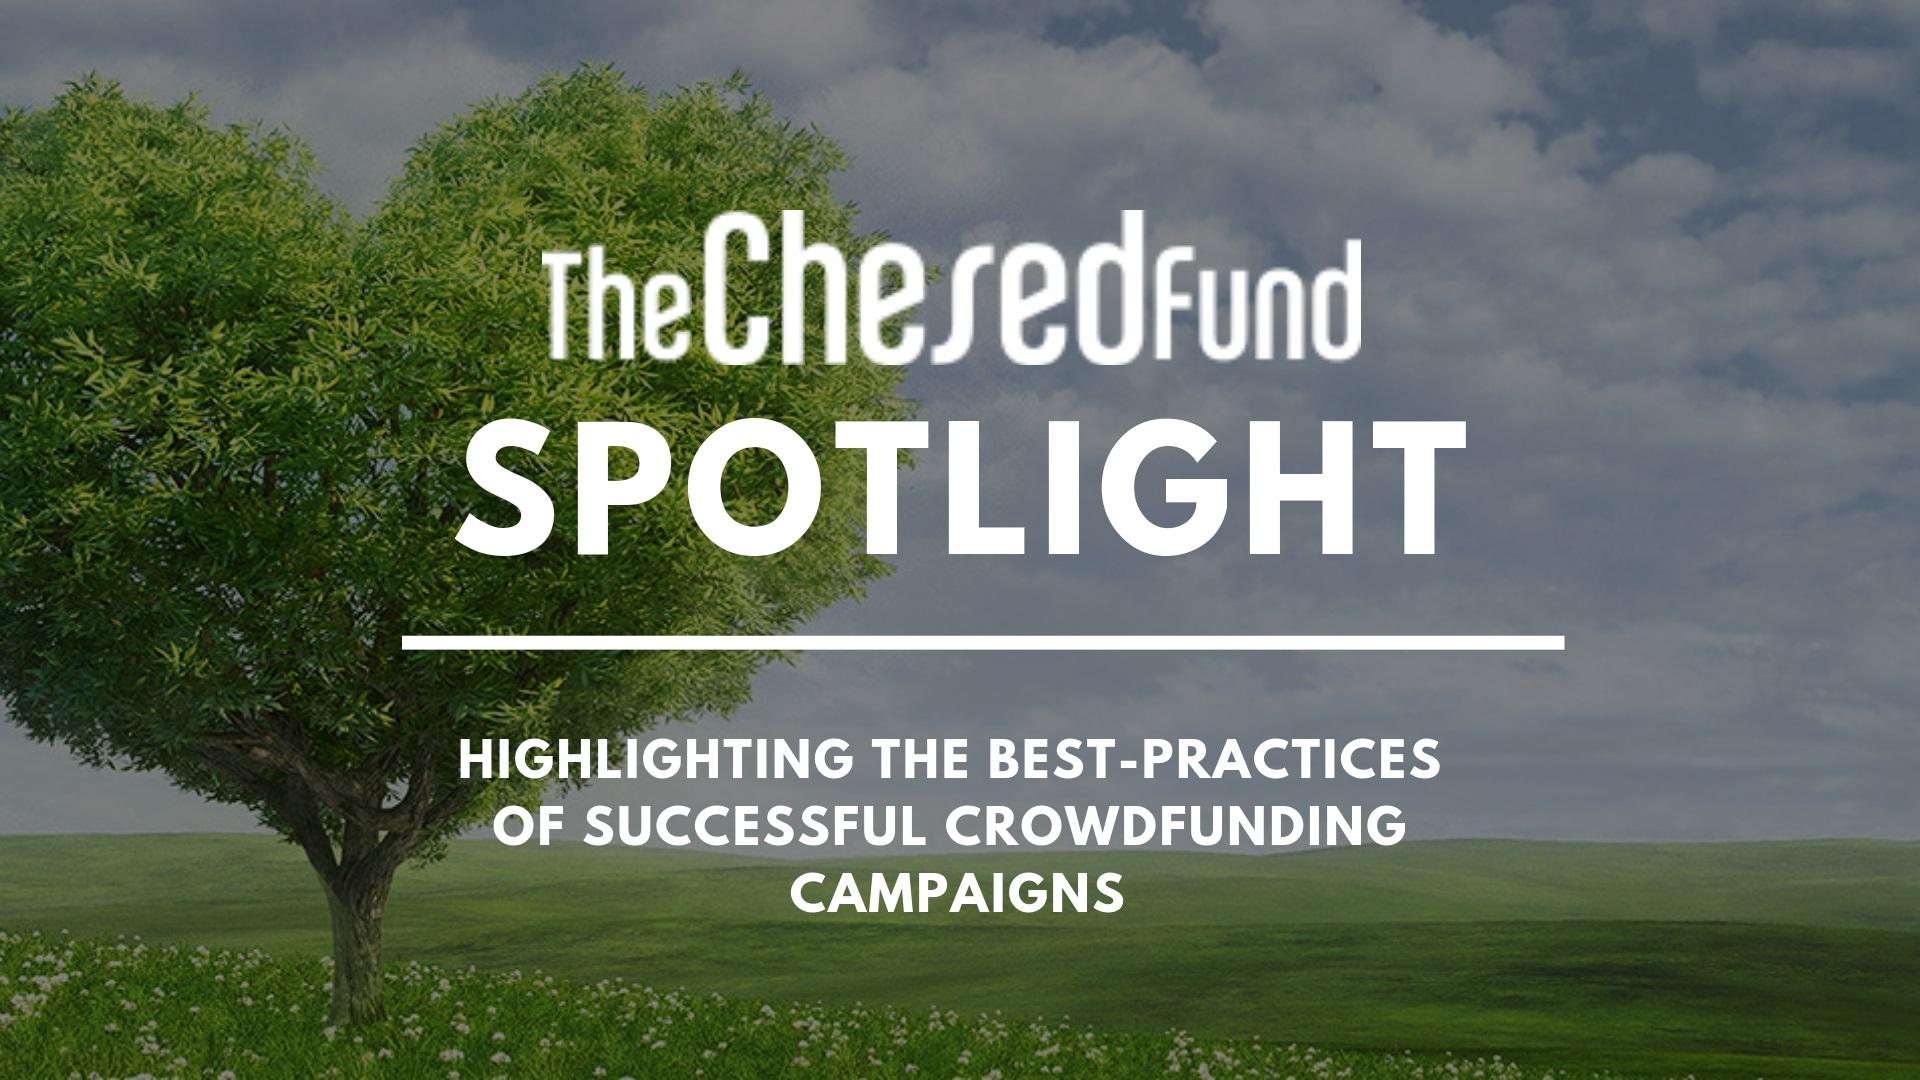 Aishel Raises $120k in Blitz Crowdfunding Campaign